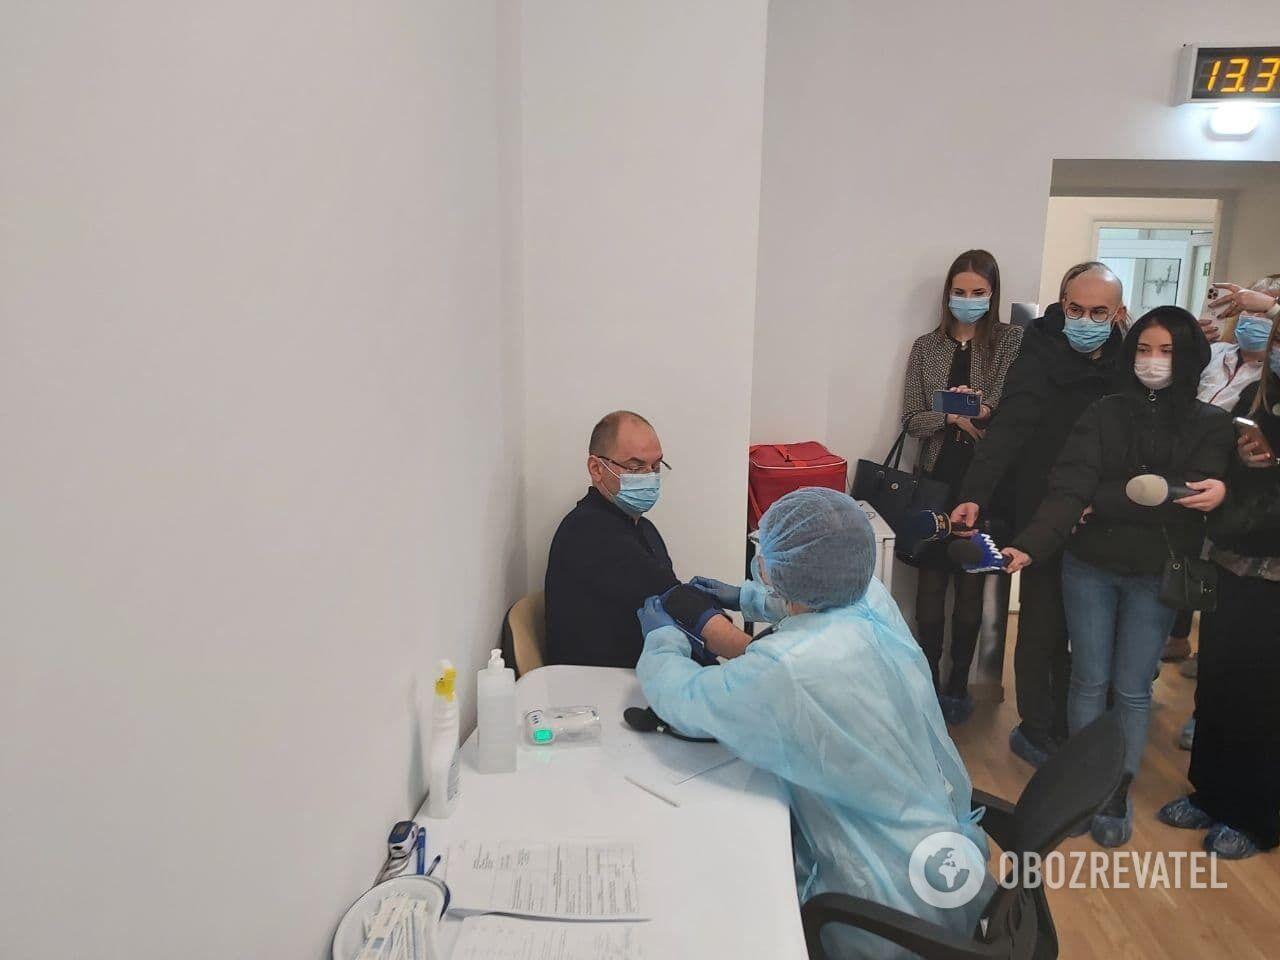 Глава МОЗ України Степанов вакцинувався.